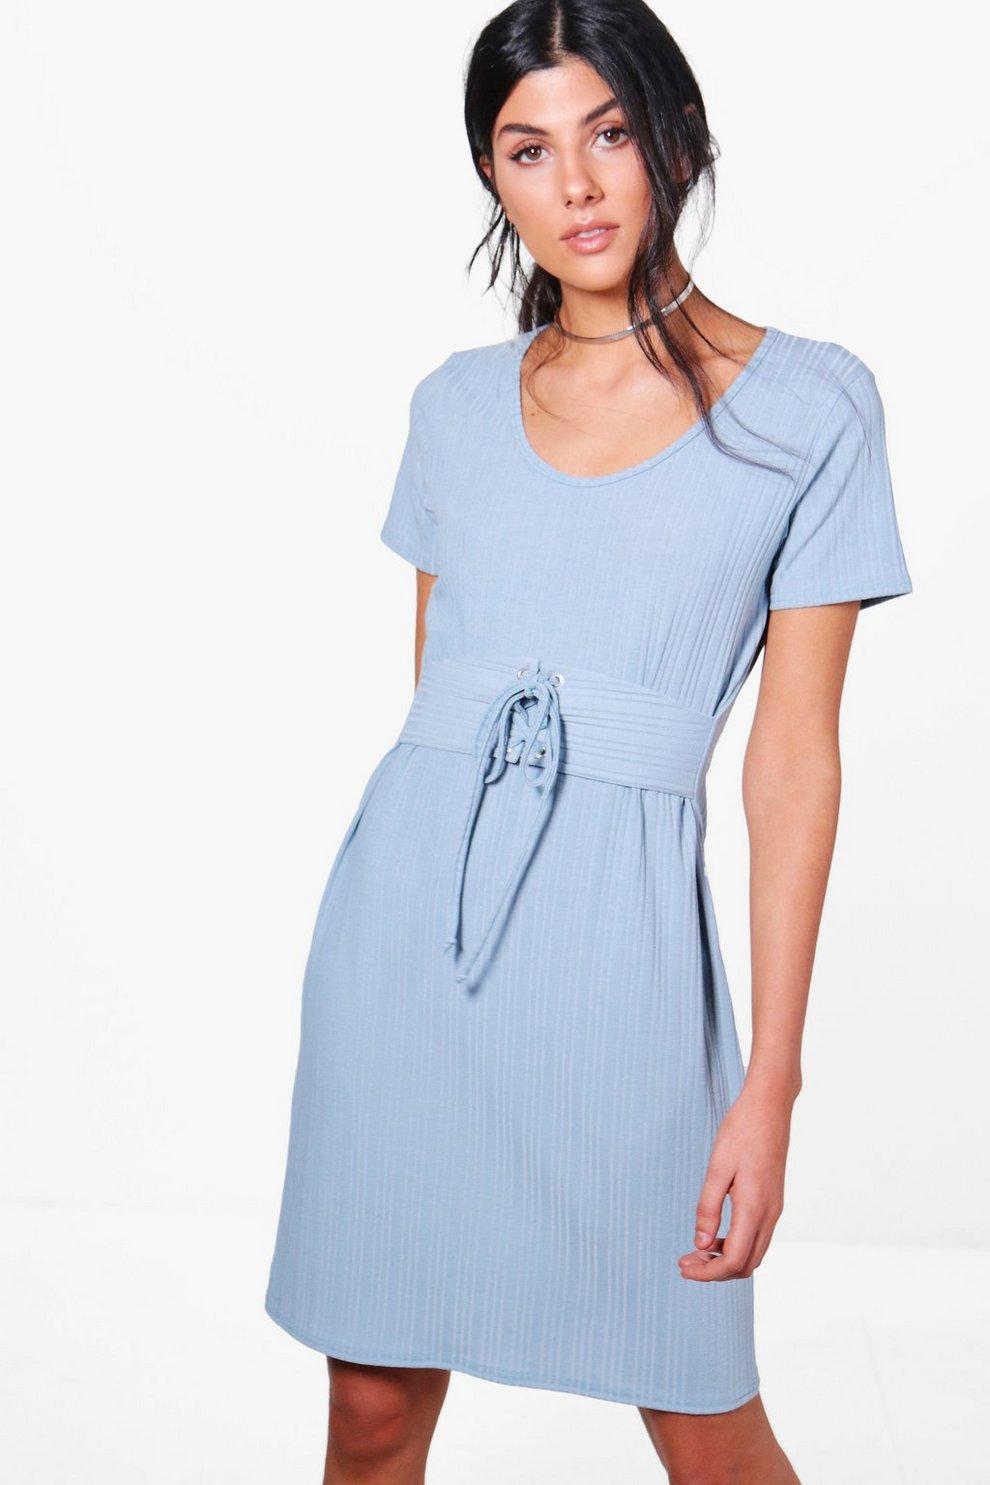 a9d2b9d8e7 Jennifer Rib Knit Corset T-Shirt Dress